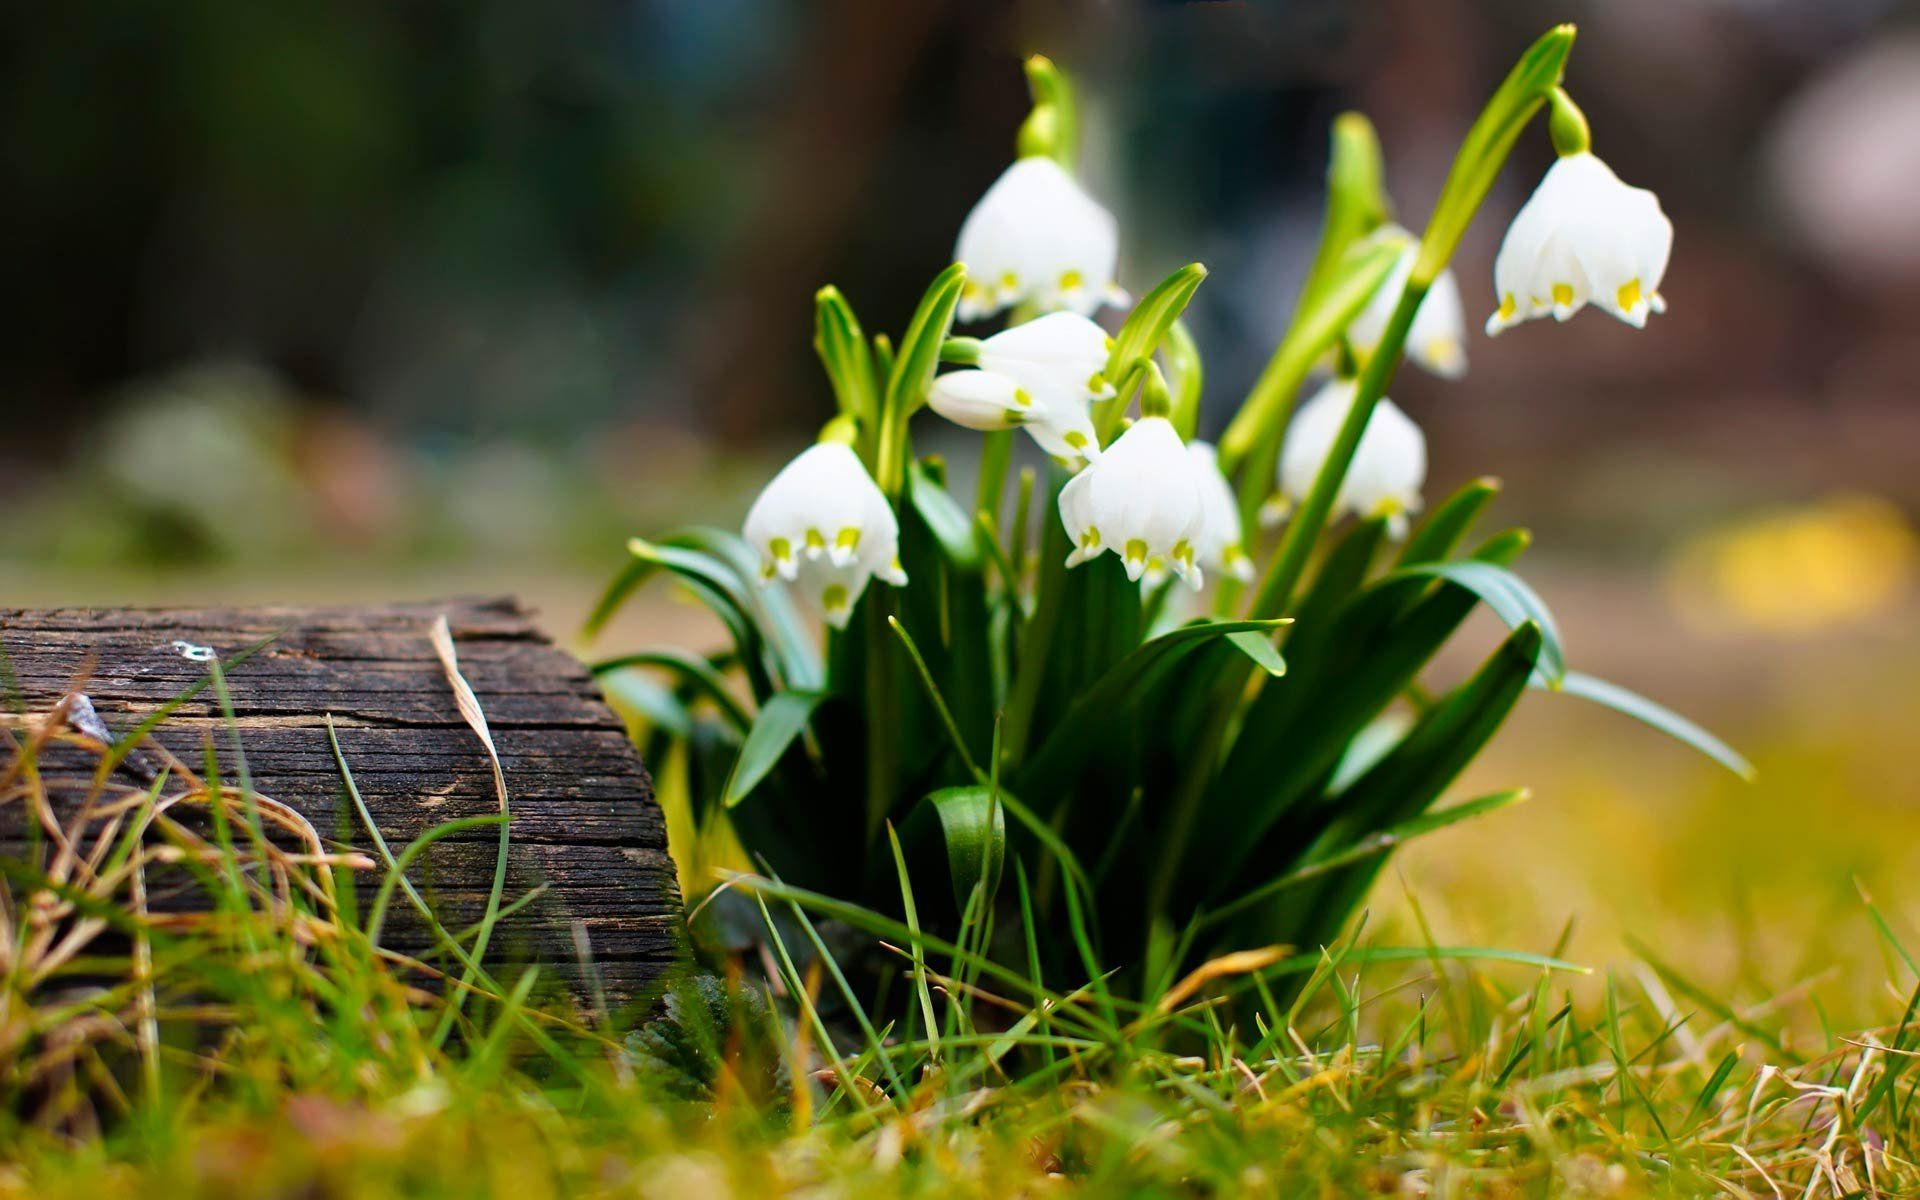 картинки весна на компьютер защитить, зевс сначала